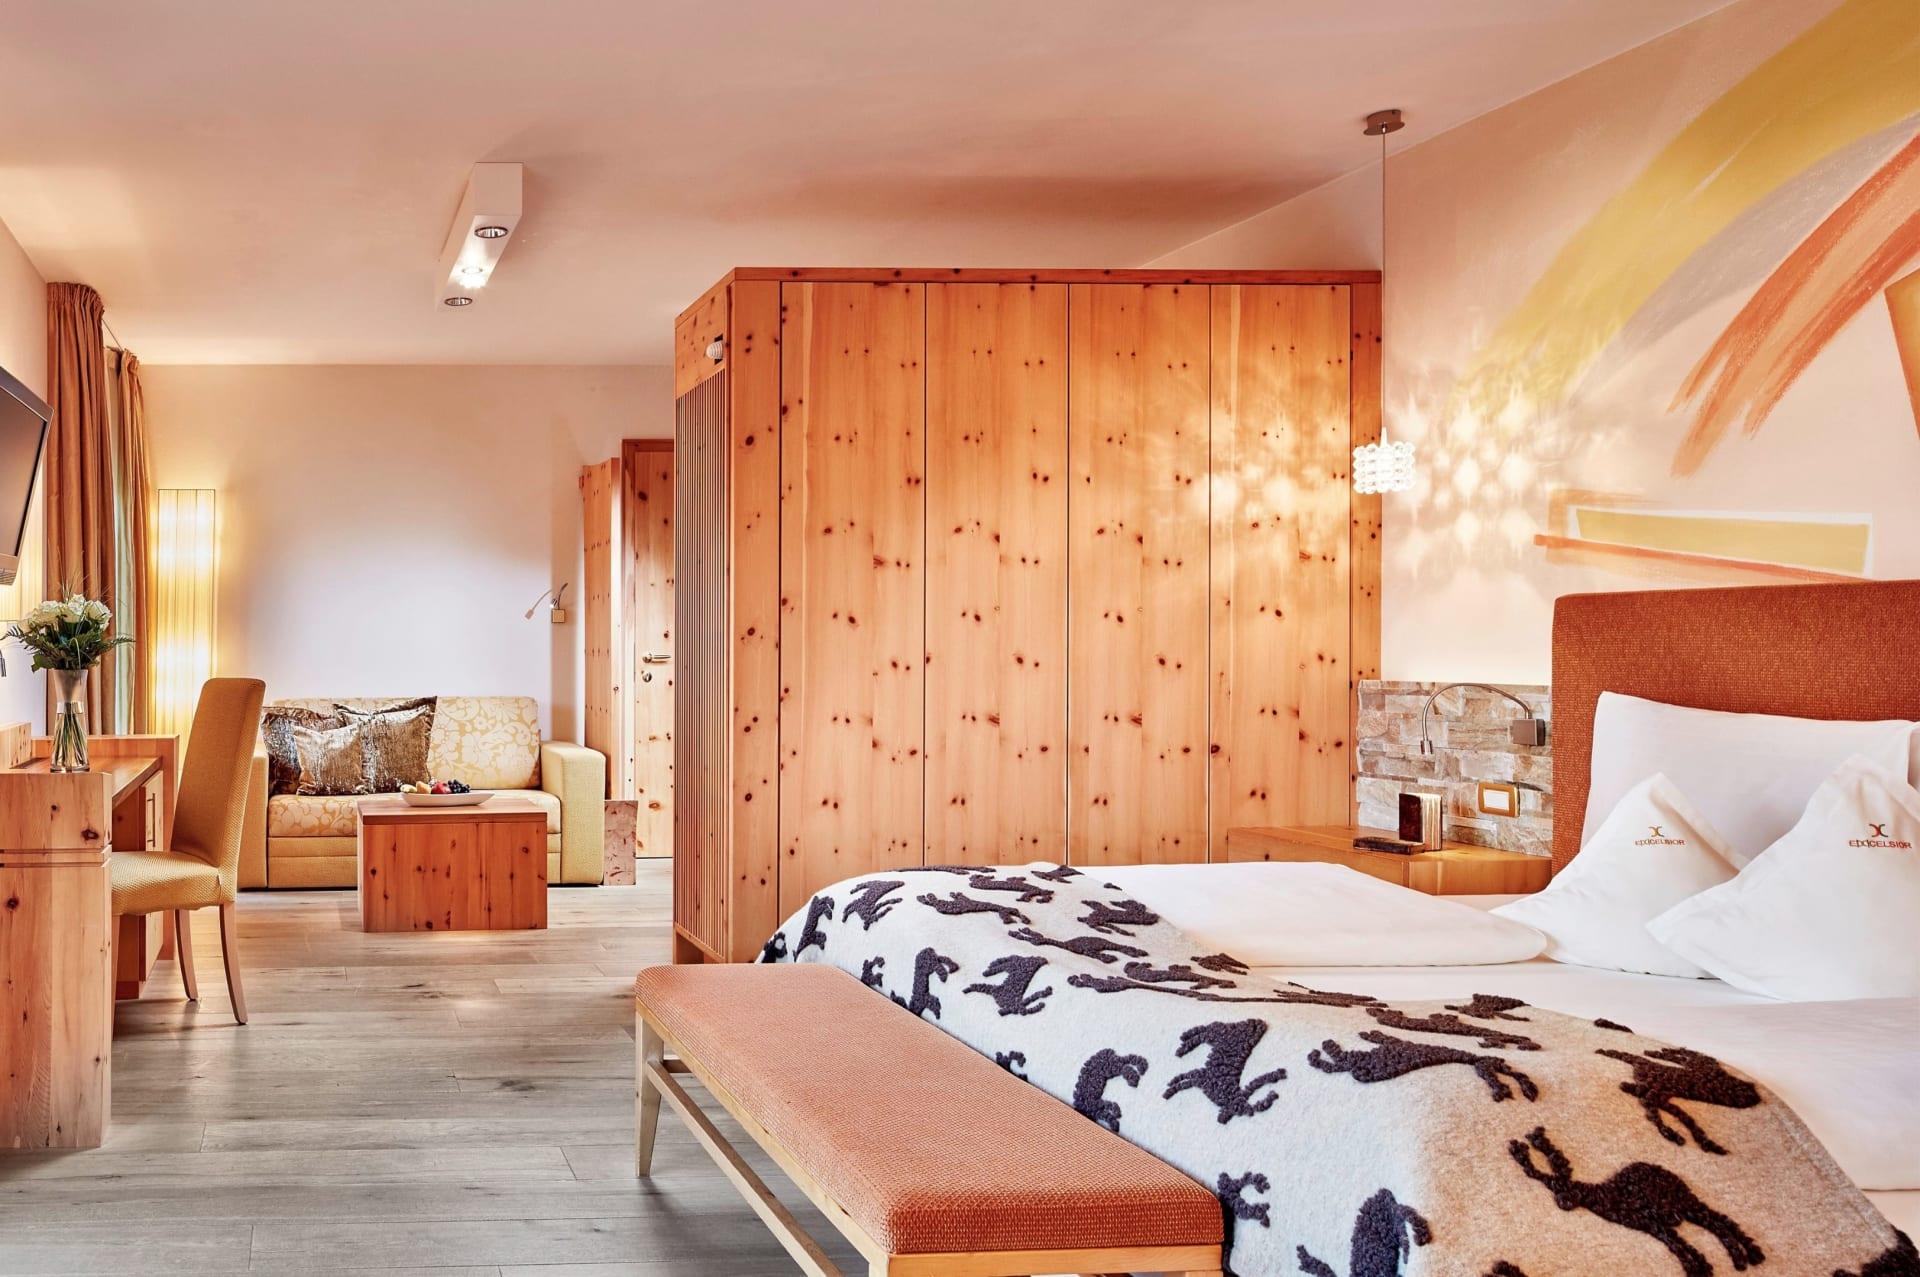 Zimmerkategorie Precious stones rooms